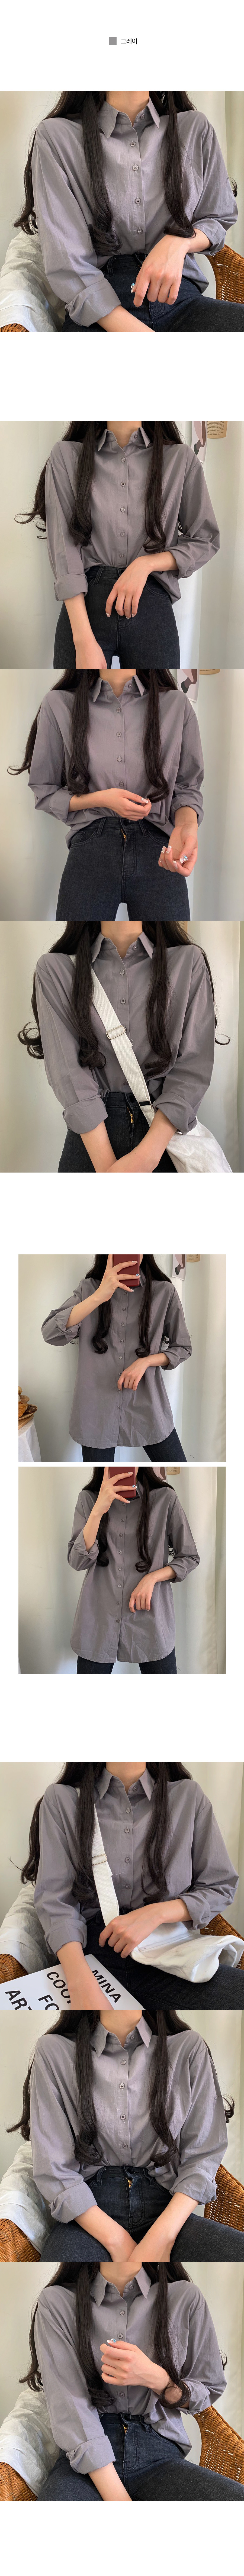 Planning overfit shirt